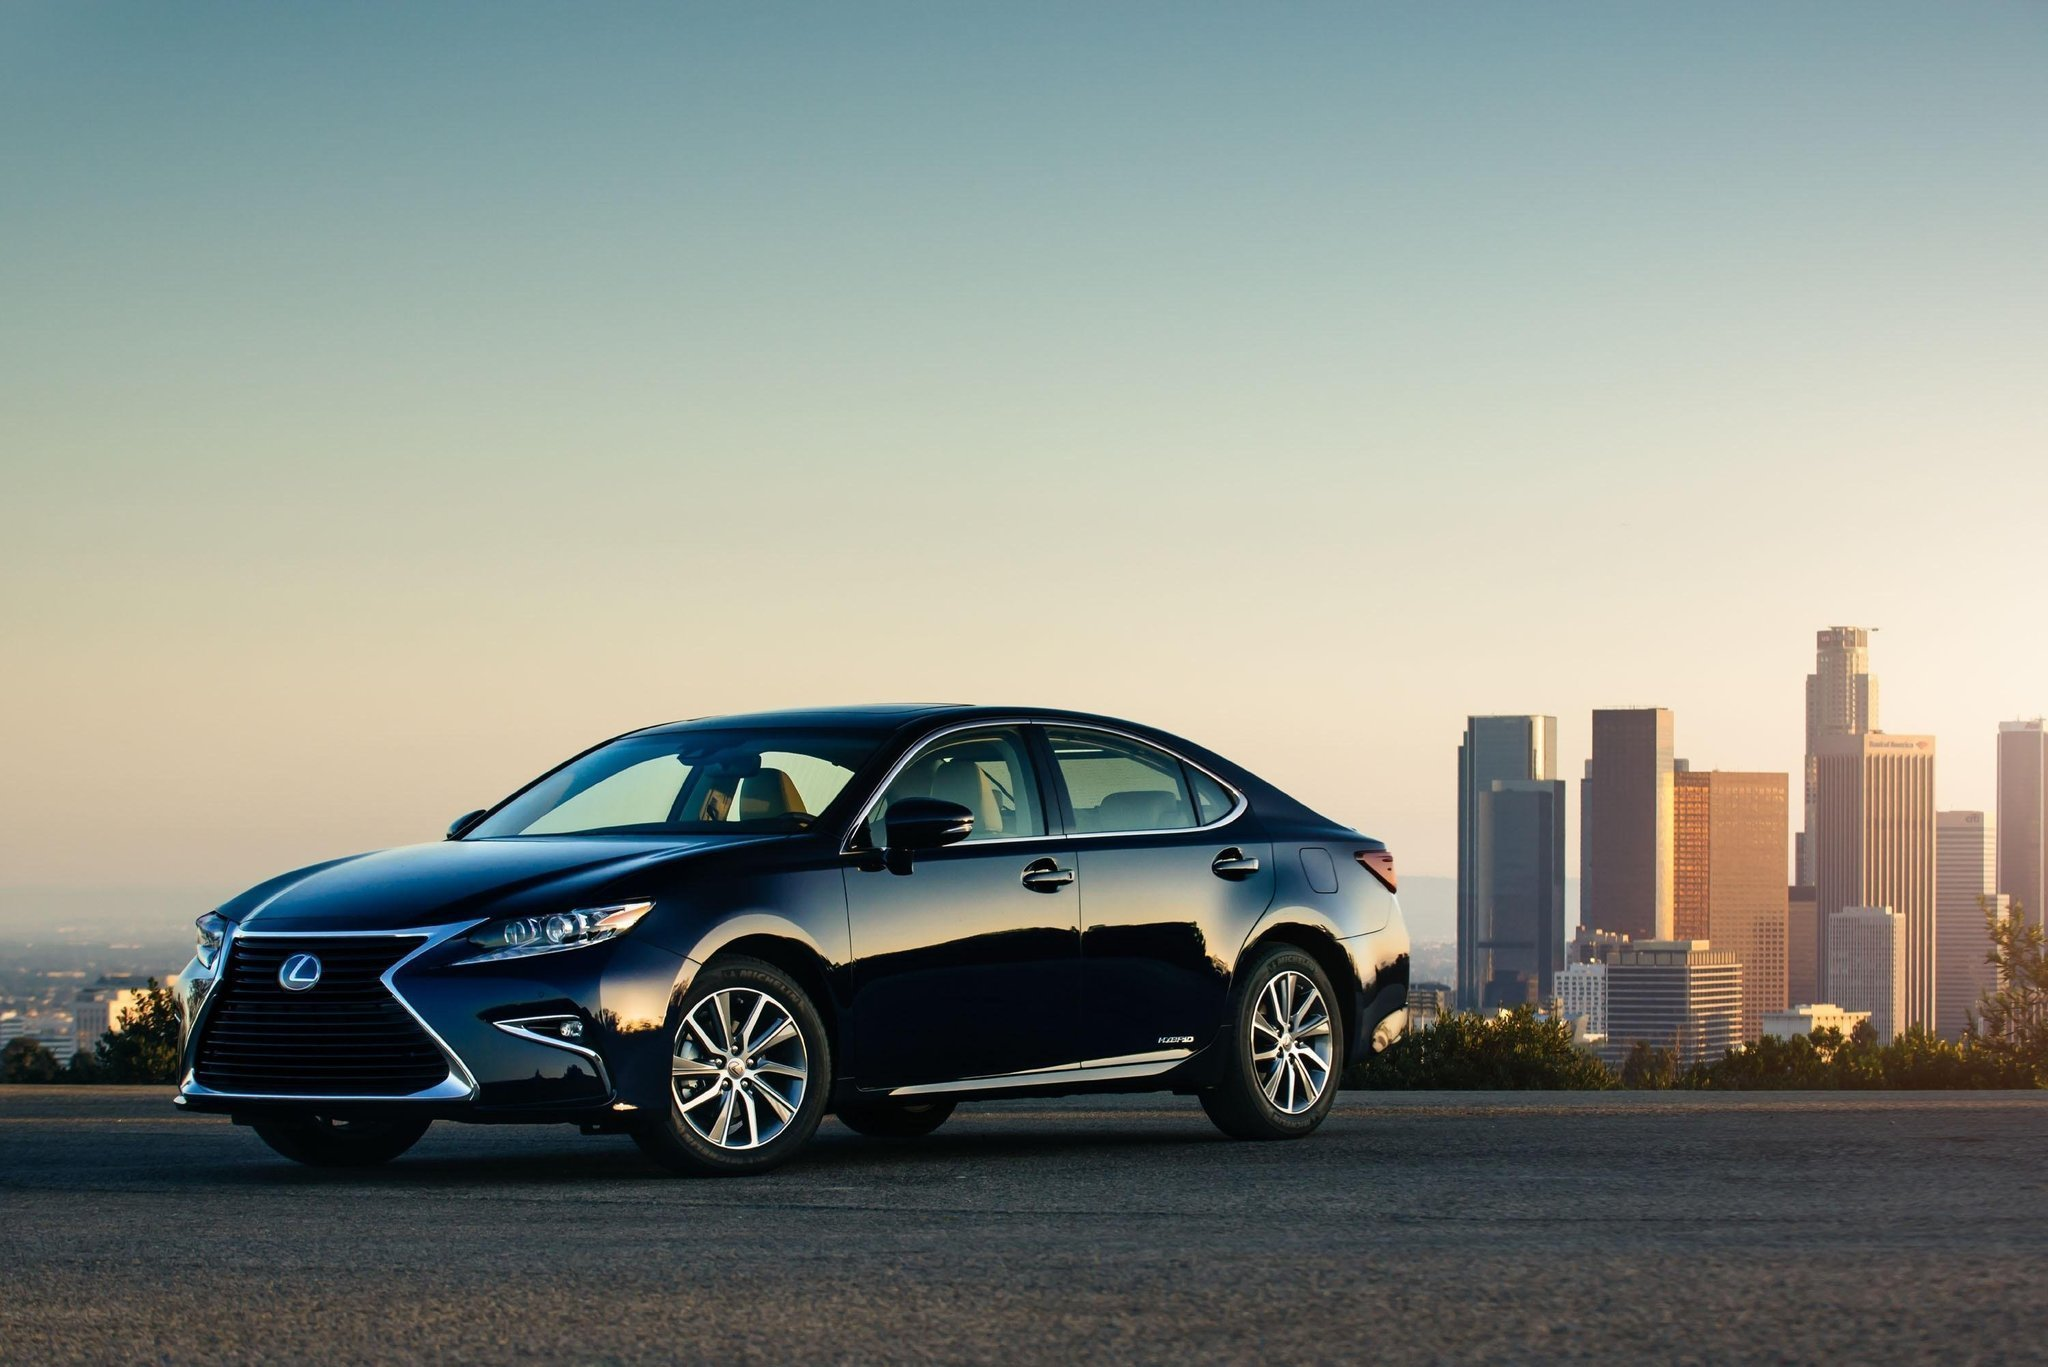 Lexus ES 300 Hybrid a smart mix of technologies roominess luxury